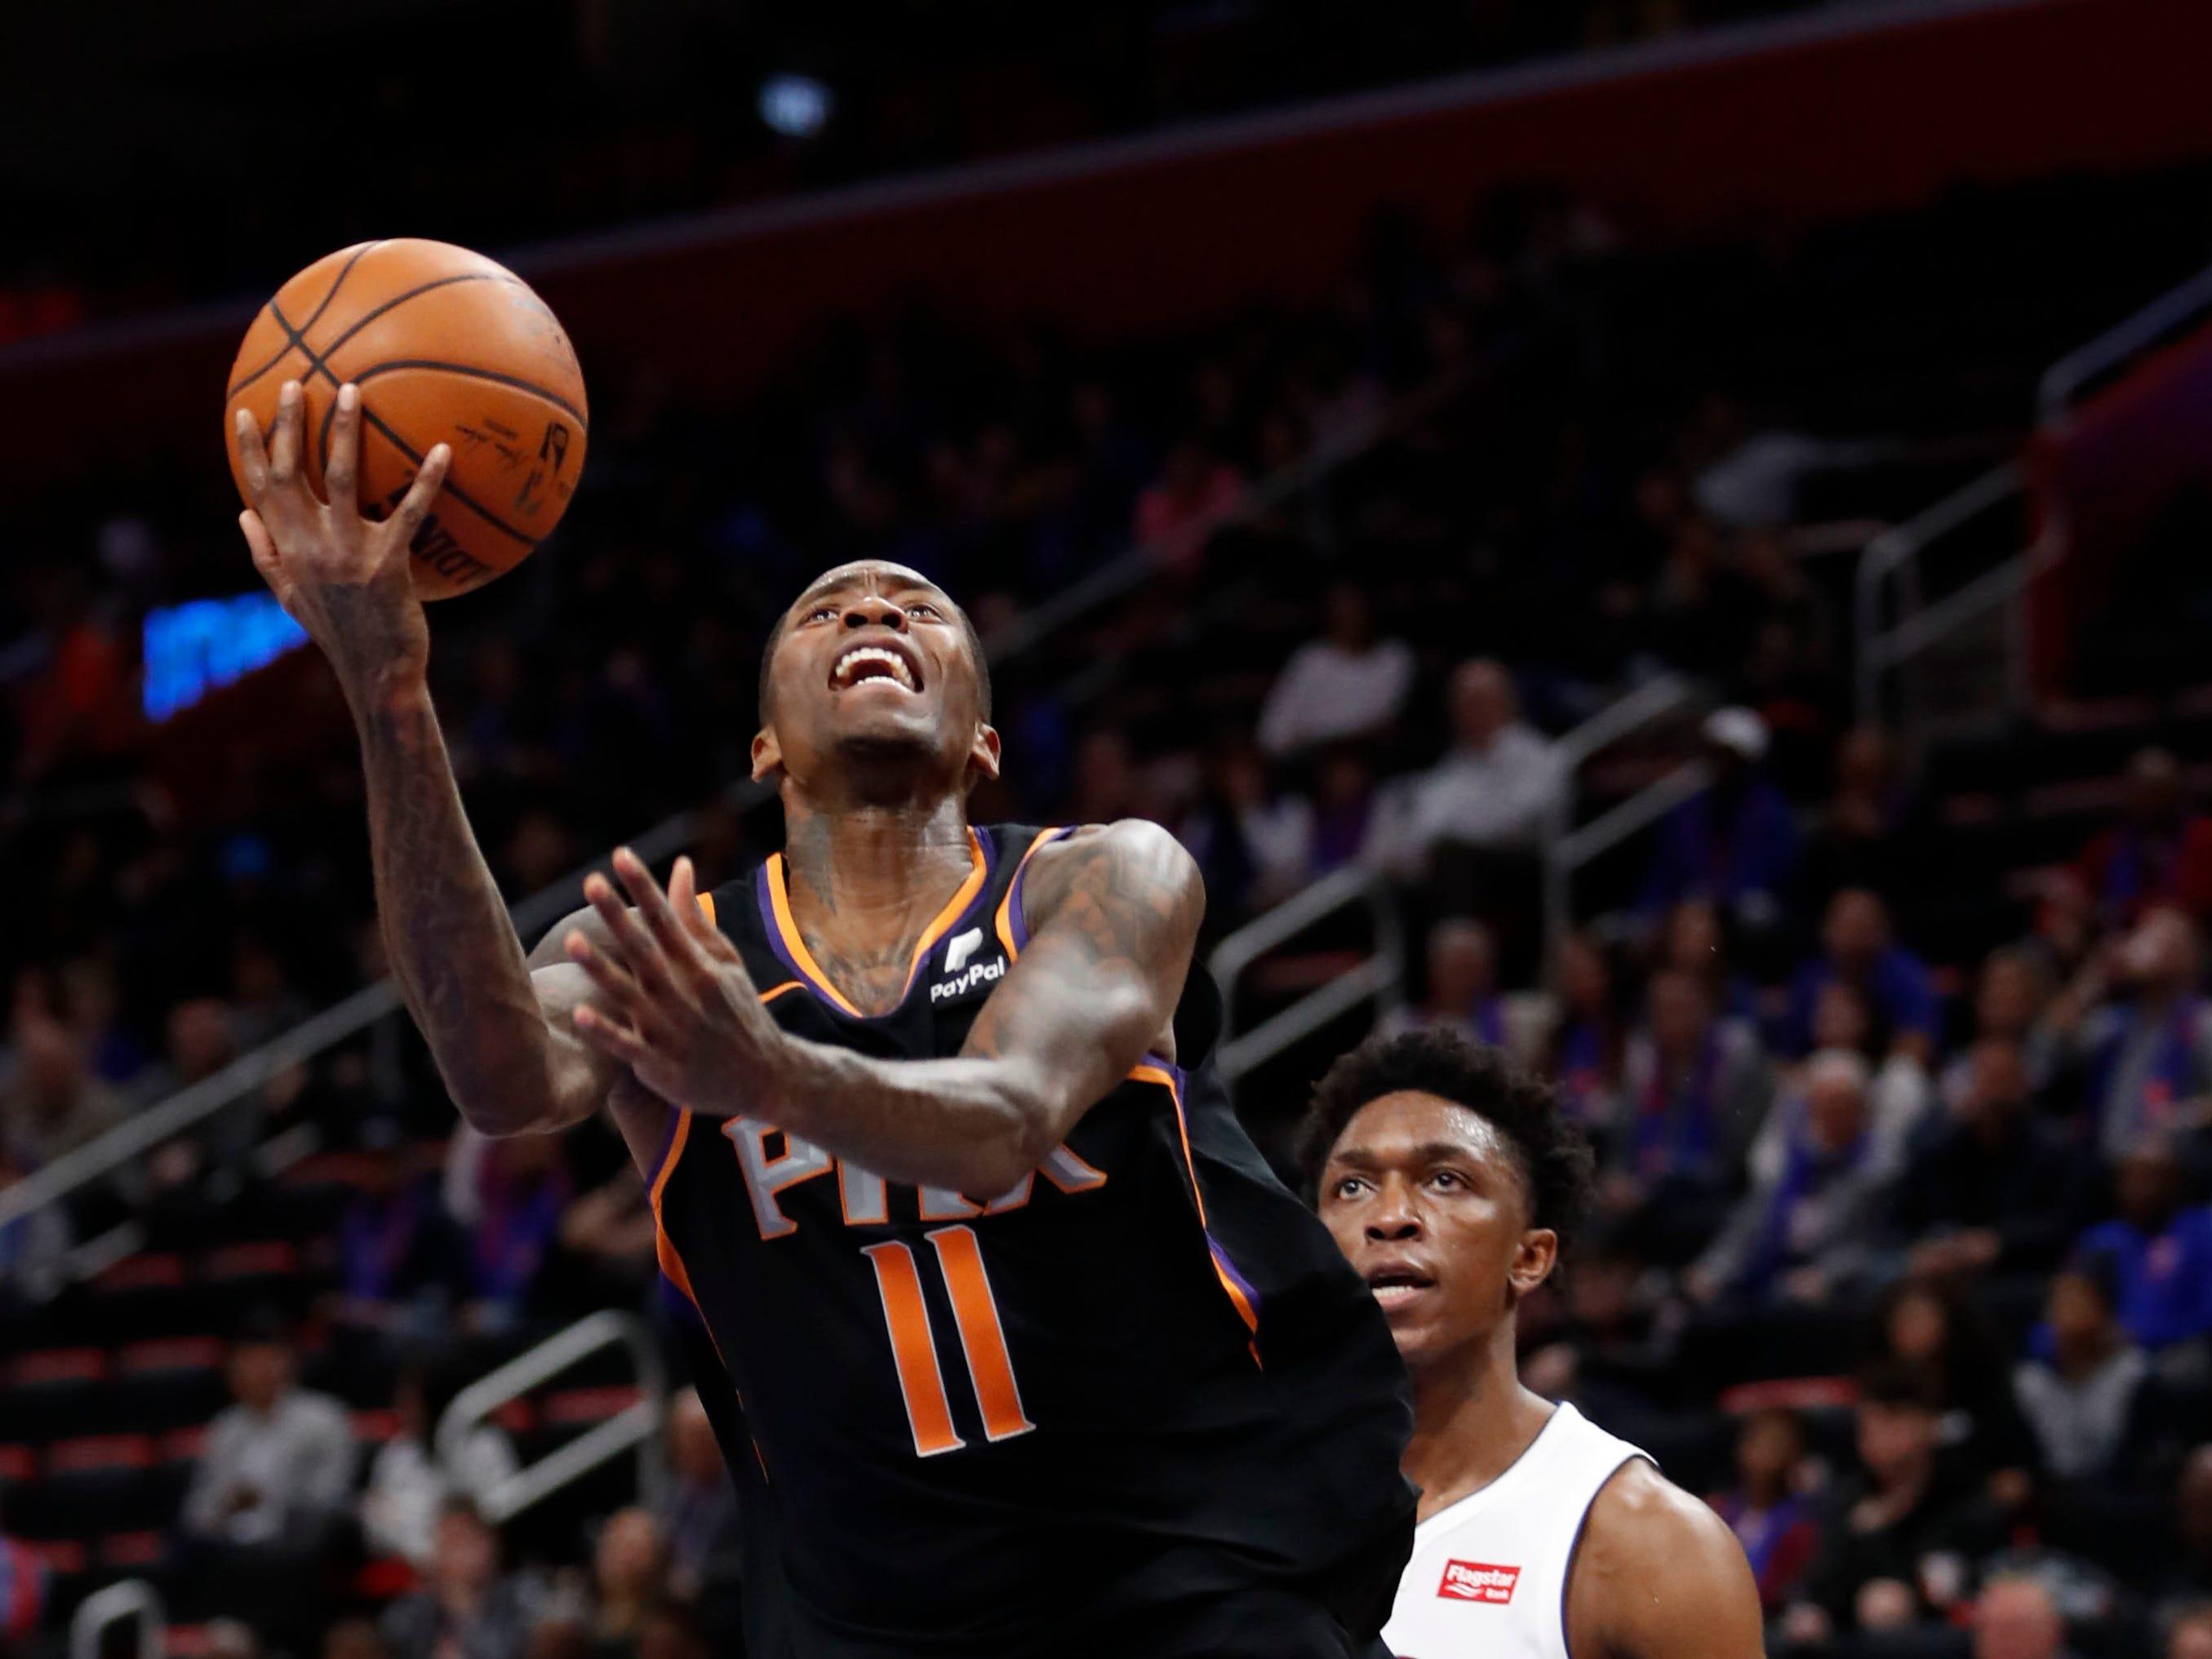 Nov 25, 2018; Detroit, MI, USA; Phoenix Suns guard Jamal Crawford (11) goes up for a shot against Detroit Pistons forward Stanley Johnson (7) during the fourth quarter at Little Caesars Arena. Mandatory Credit: Raj Mehta-USA TODAY Sports